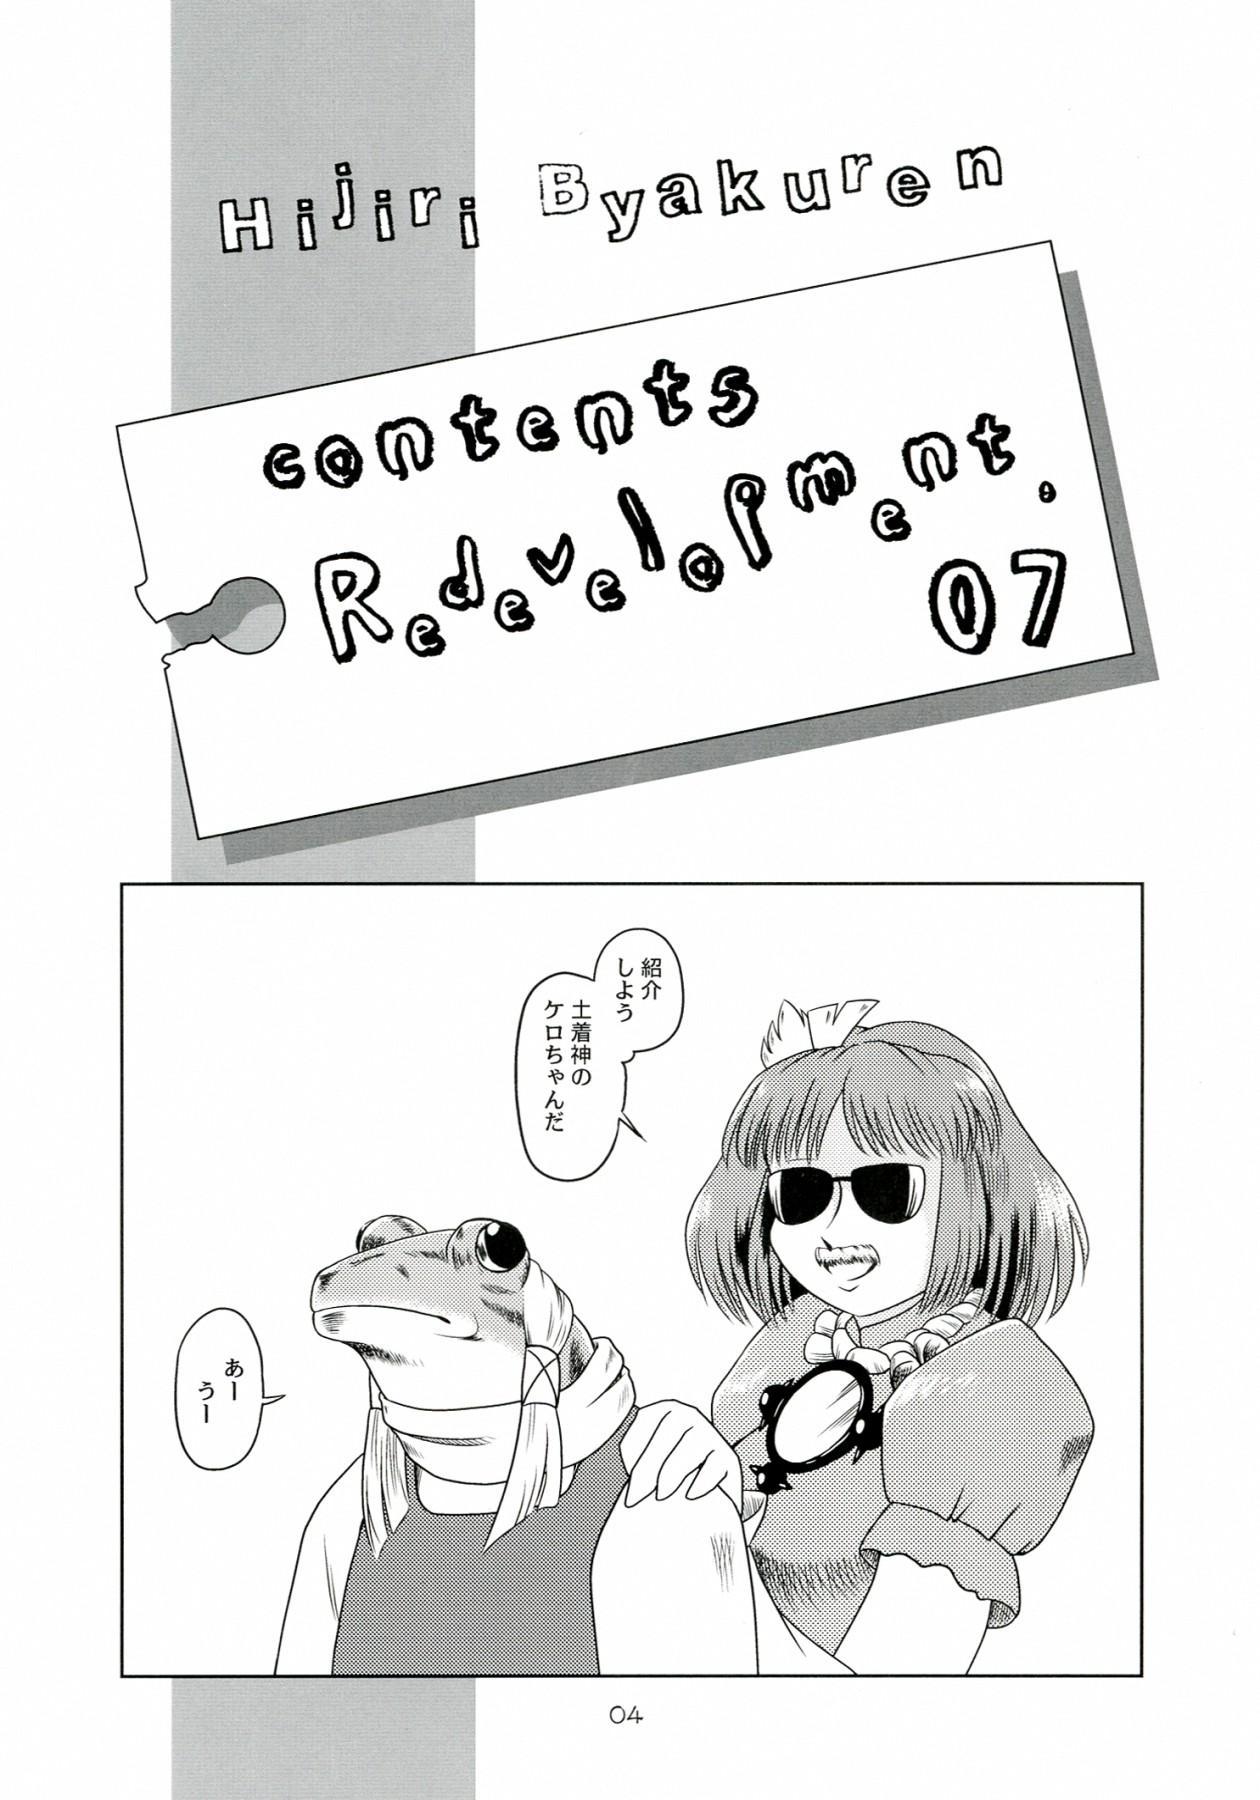 (C77) [Sekitan Bukuro (Fey Tas)] Hijiri Byakuren -Oku-sama wa Fuujin-sama 3- (Touhou Project) 3